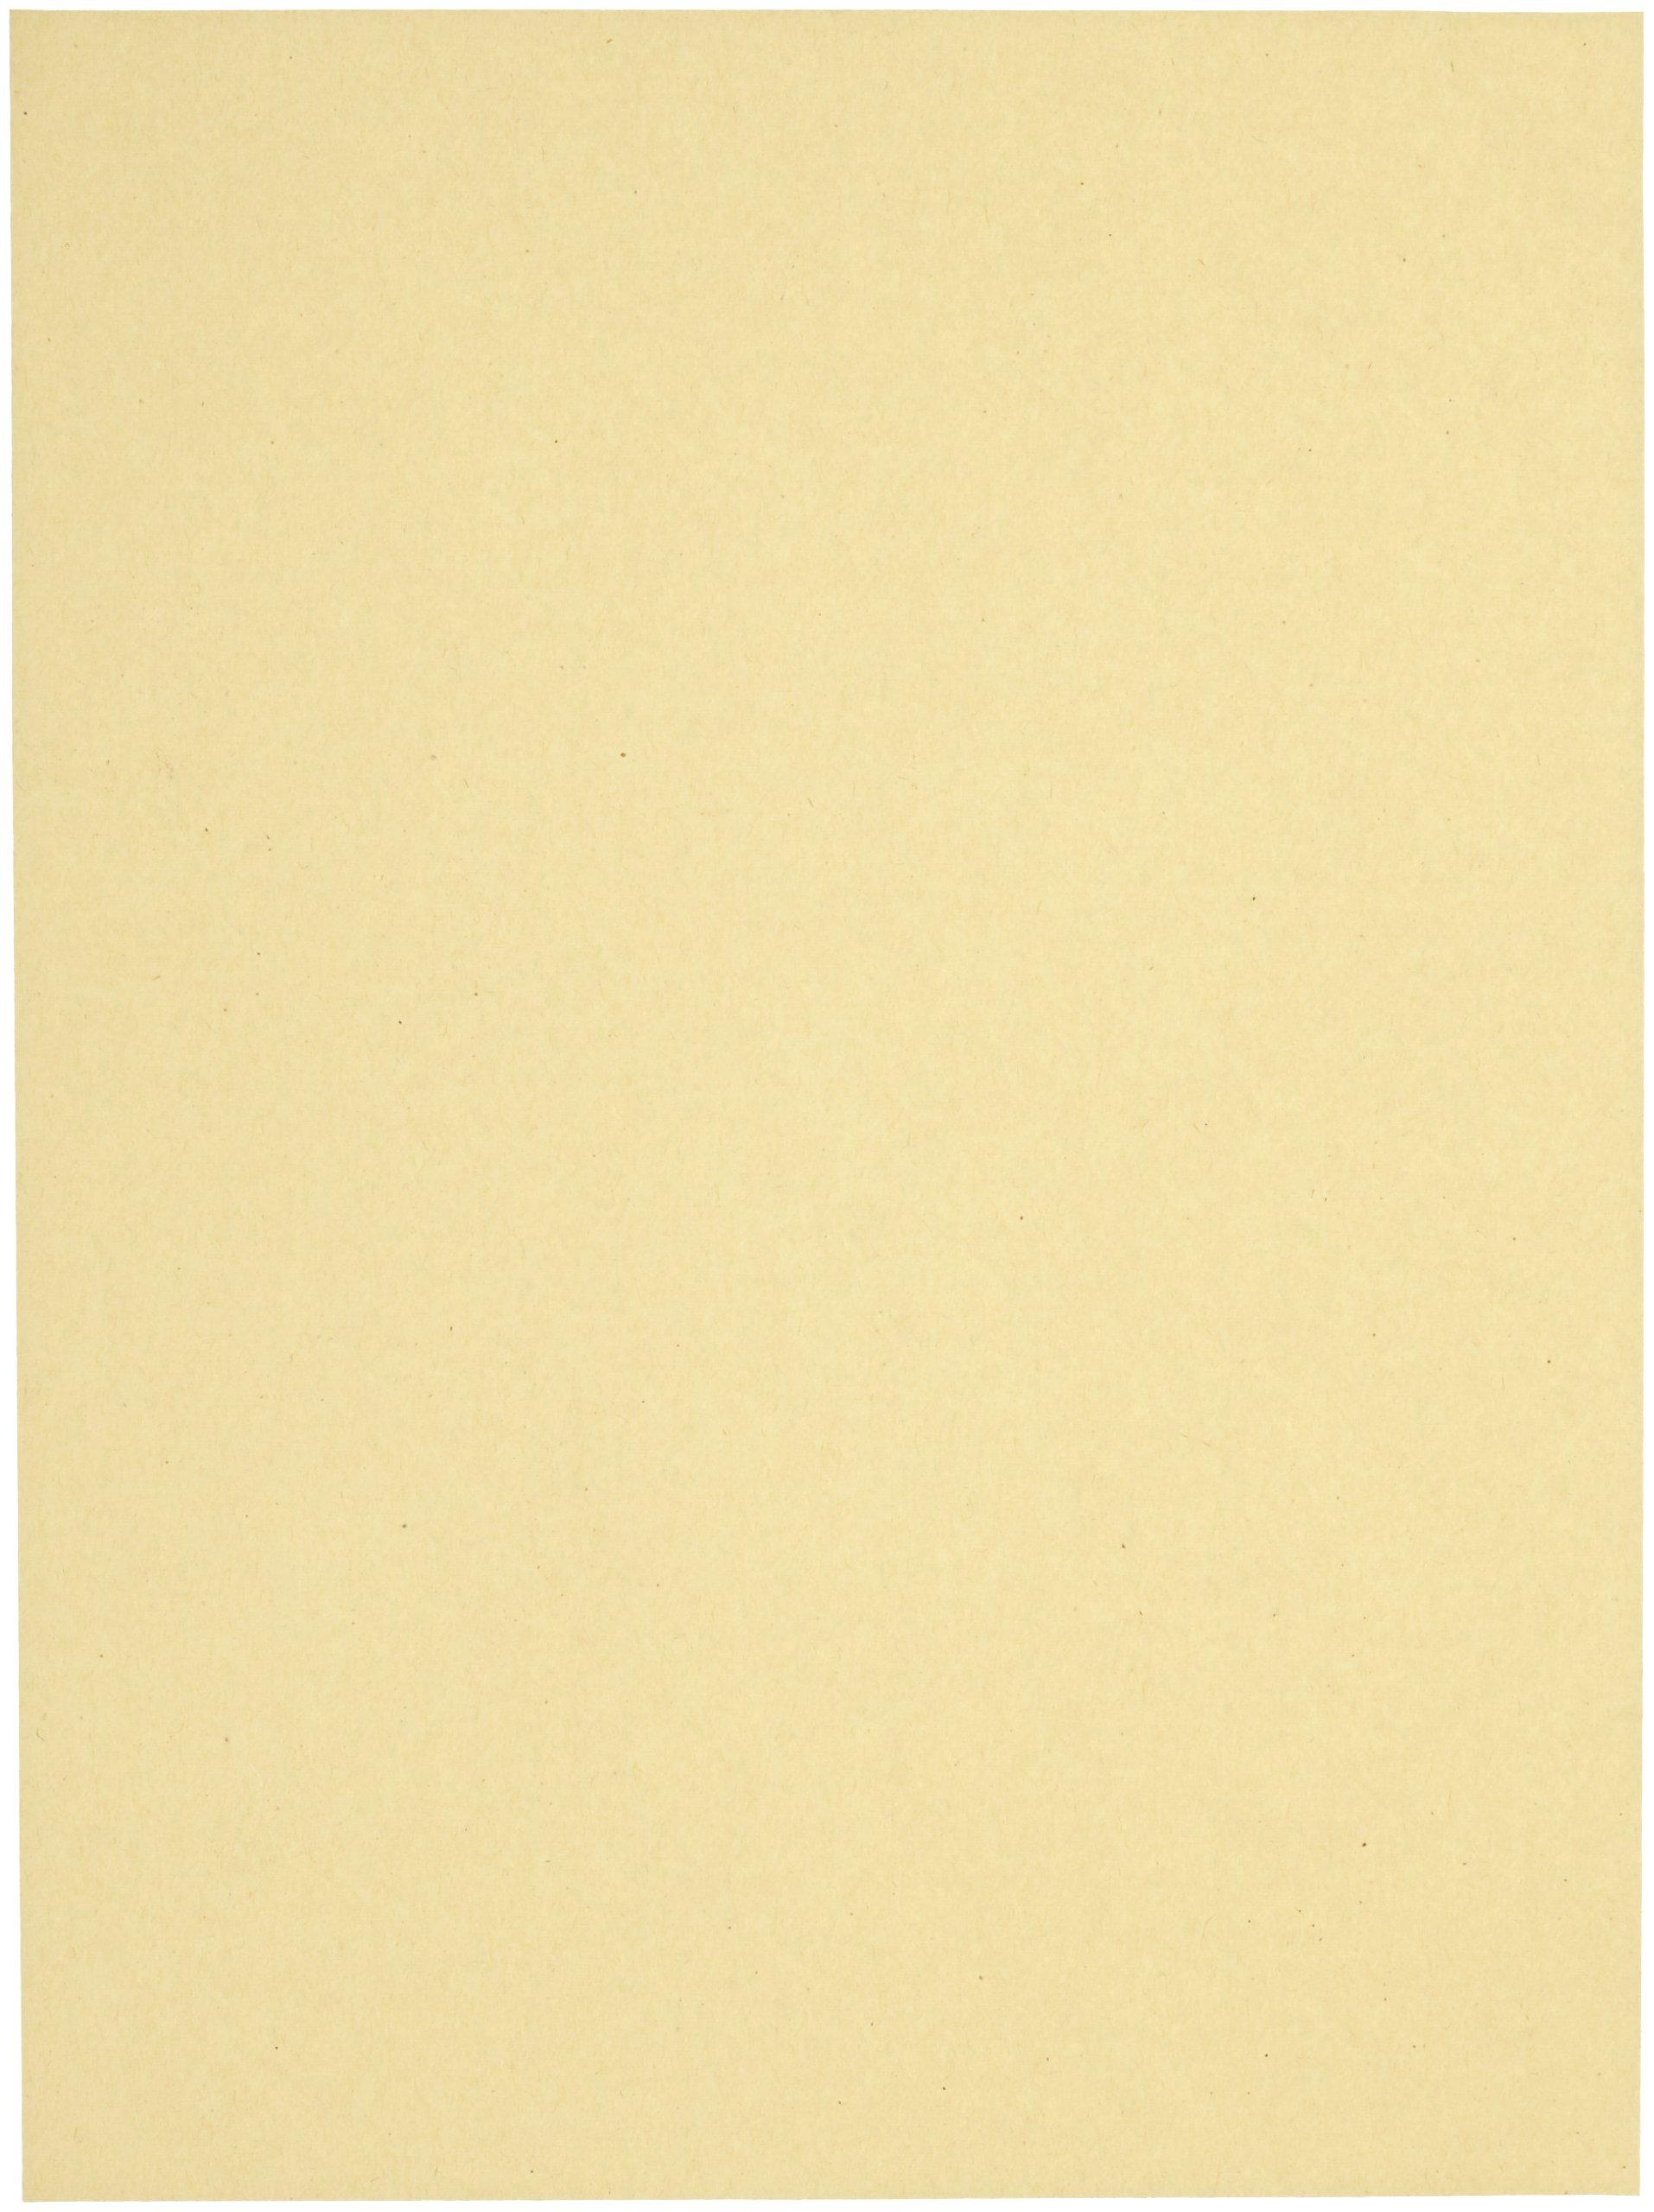 Sax Multi-Purpose Drawing Paper, 56 lbs, 9 x 12 Inches, Manila Cream, Pack of 500 - 085559